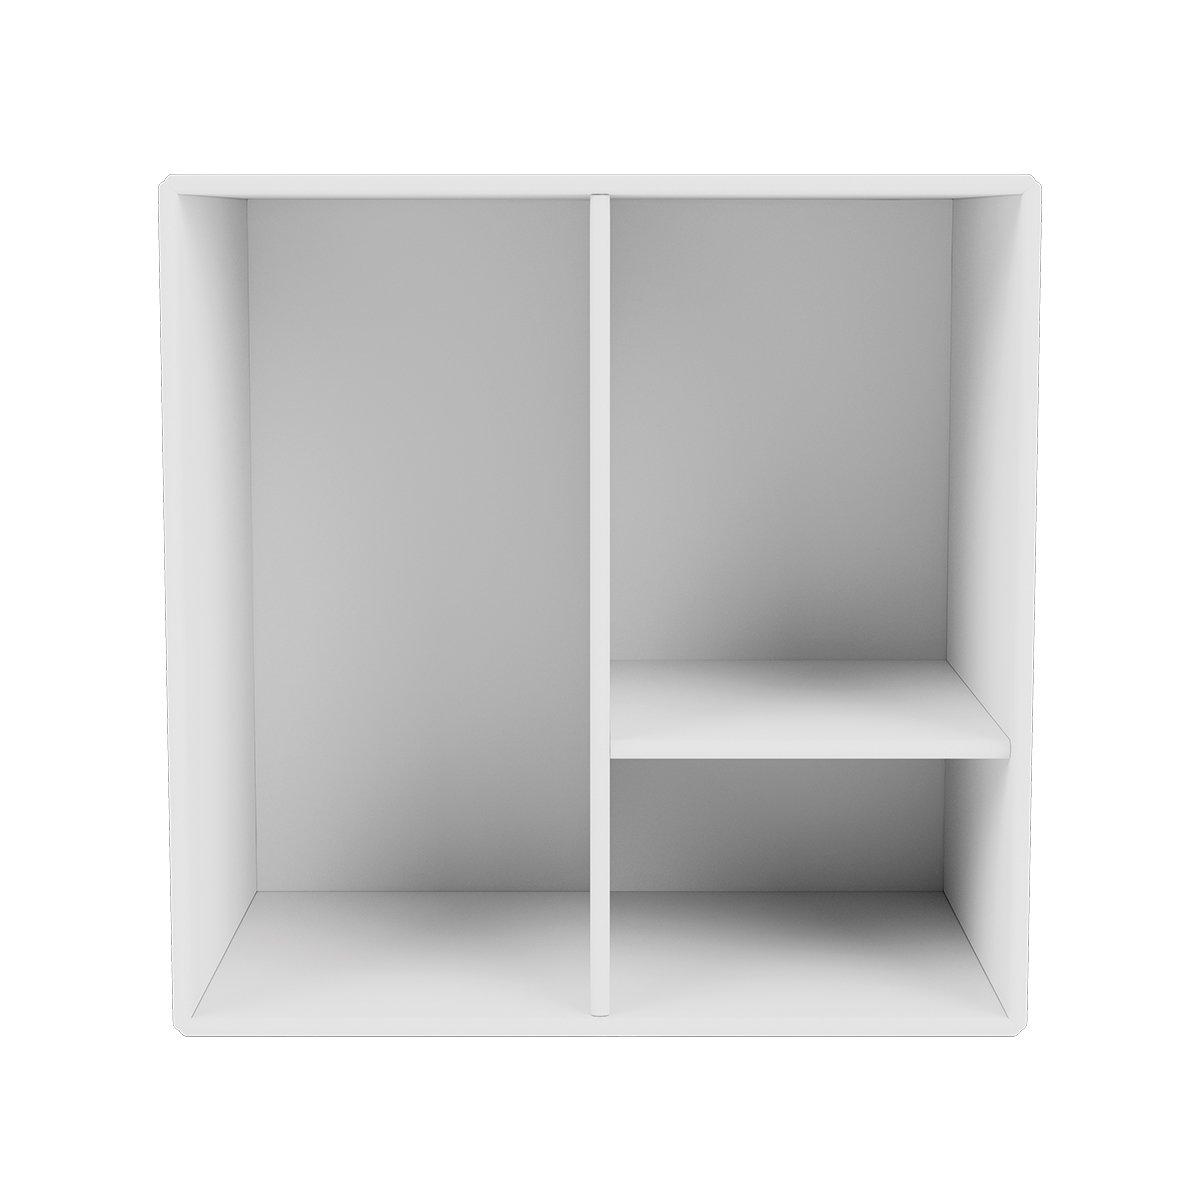 Montana Mini Wandmodule Met Planken - New White